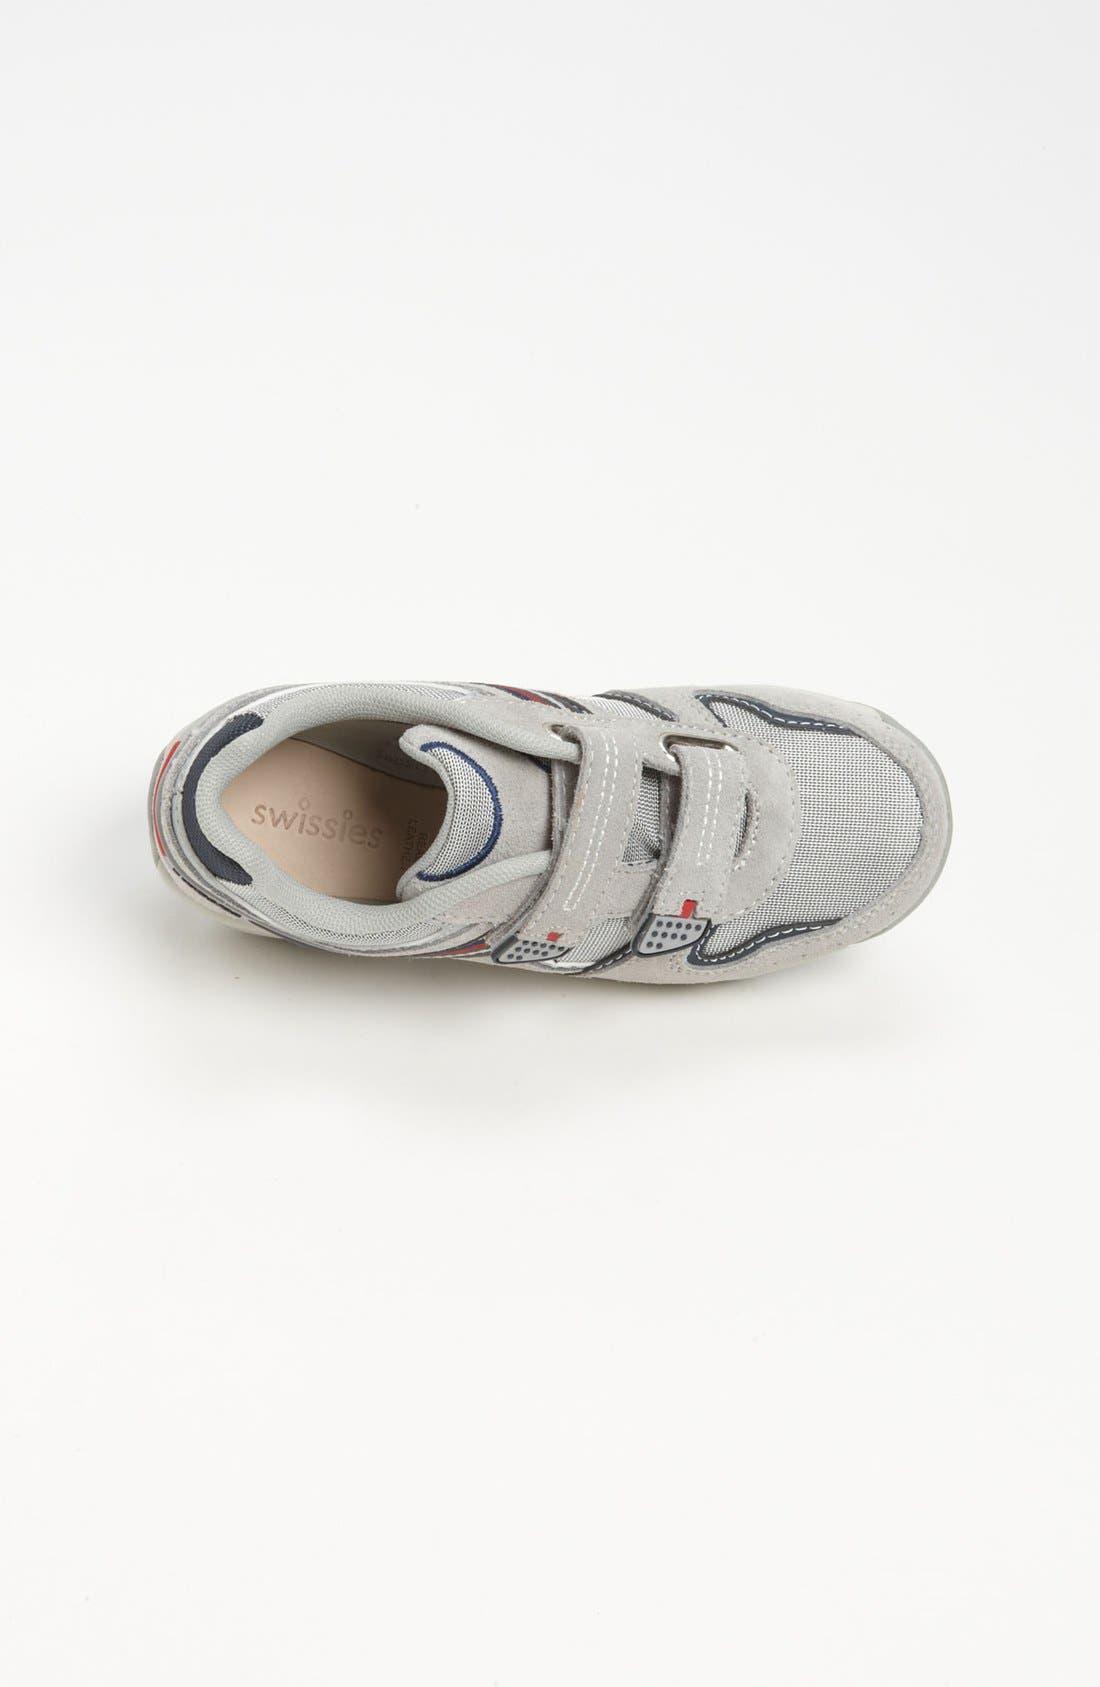 Alternate Image 3  - Swissies 'Terry' Sneaker (Toddler & Little Kid)